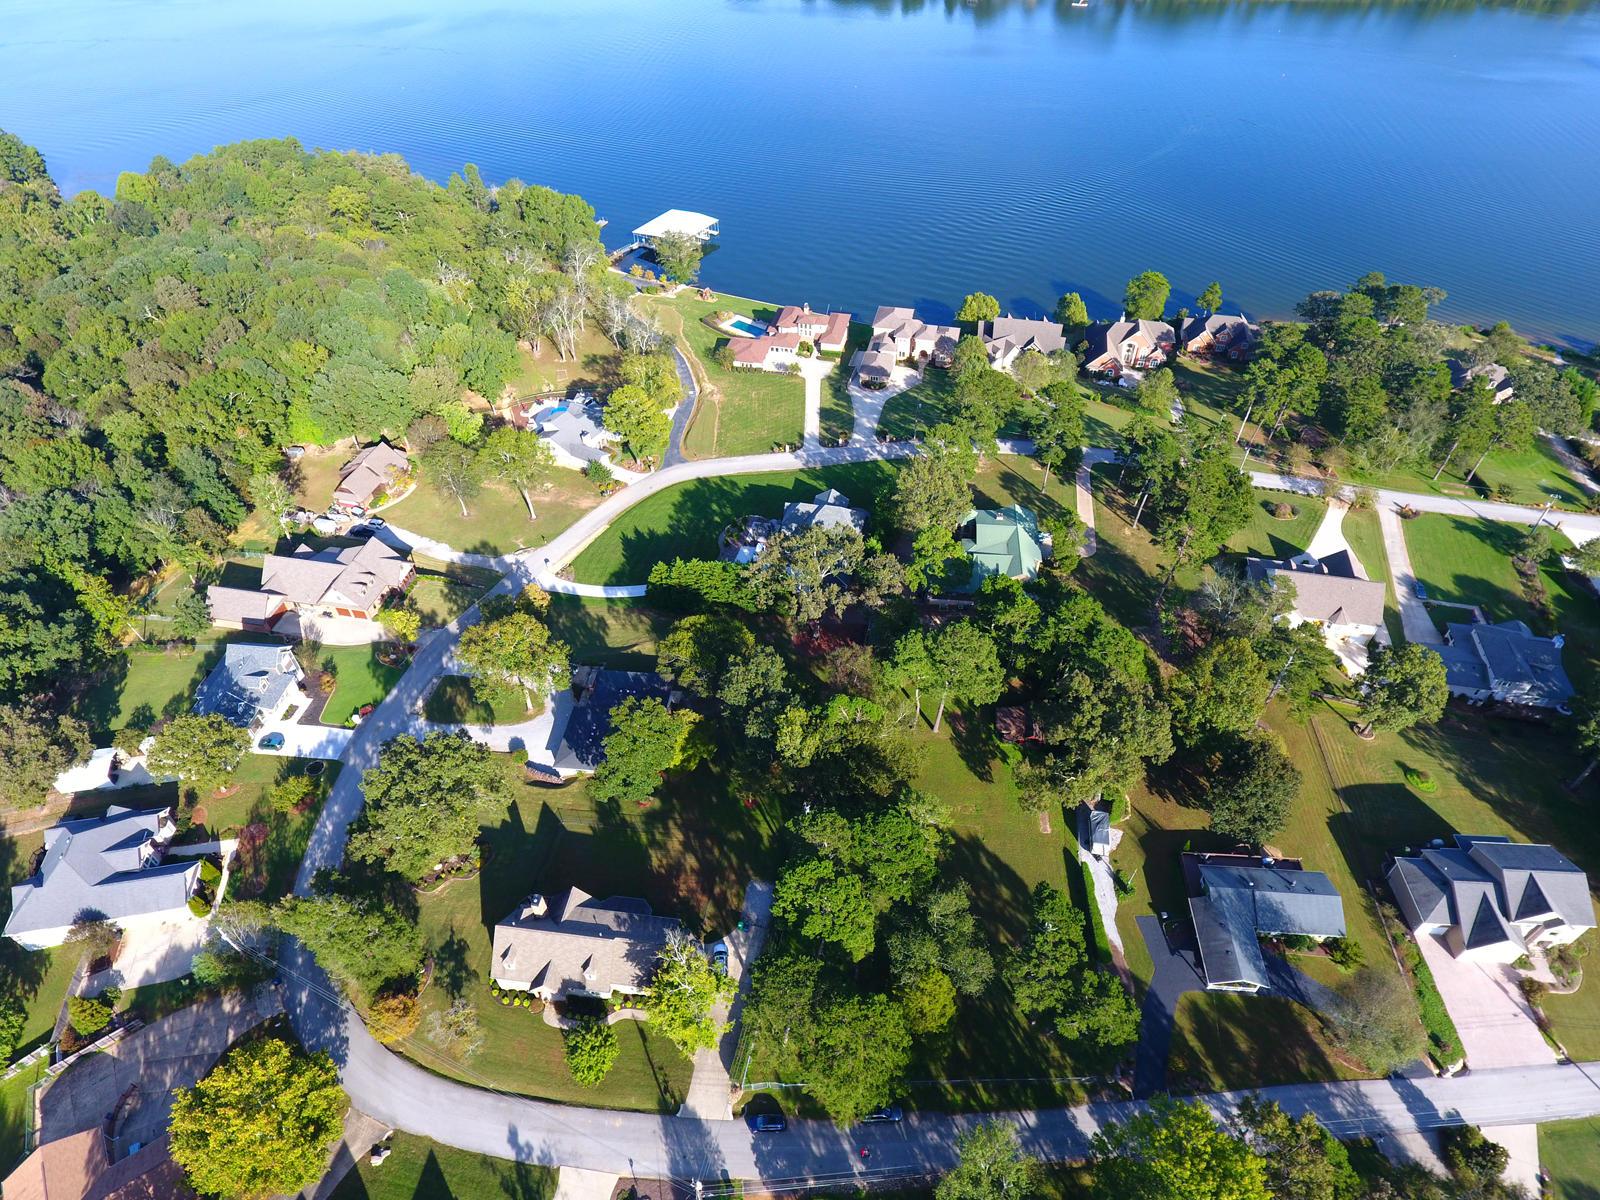 6914 Lakeshore Dr, Chattanooga, TN 37416